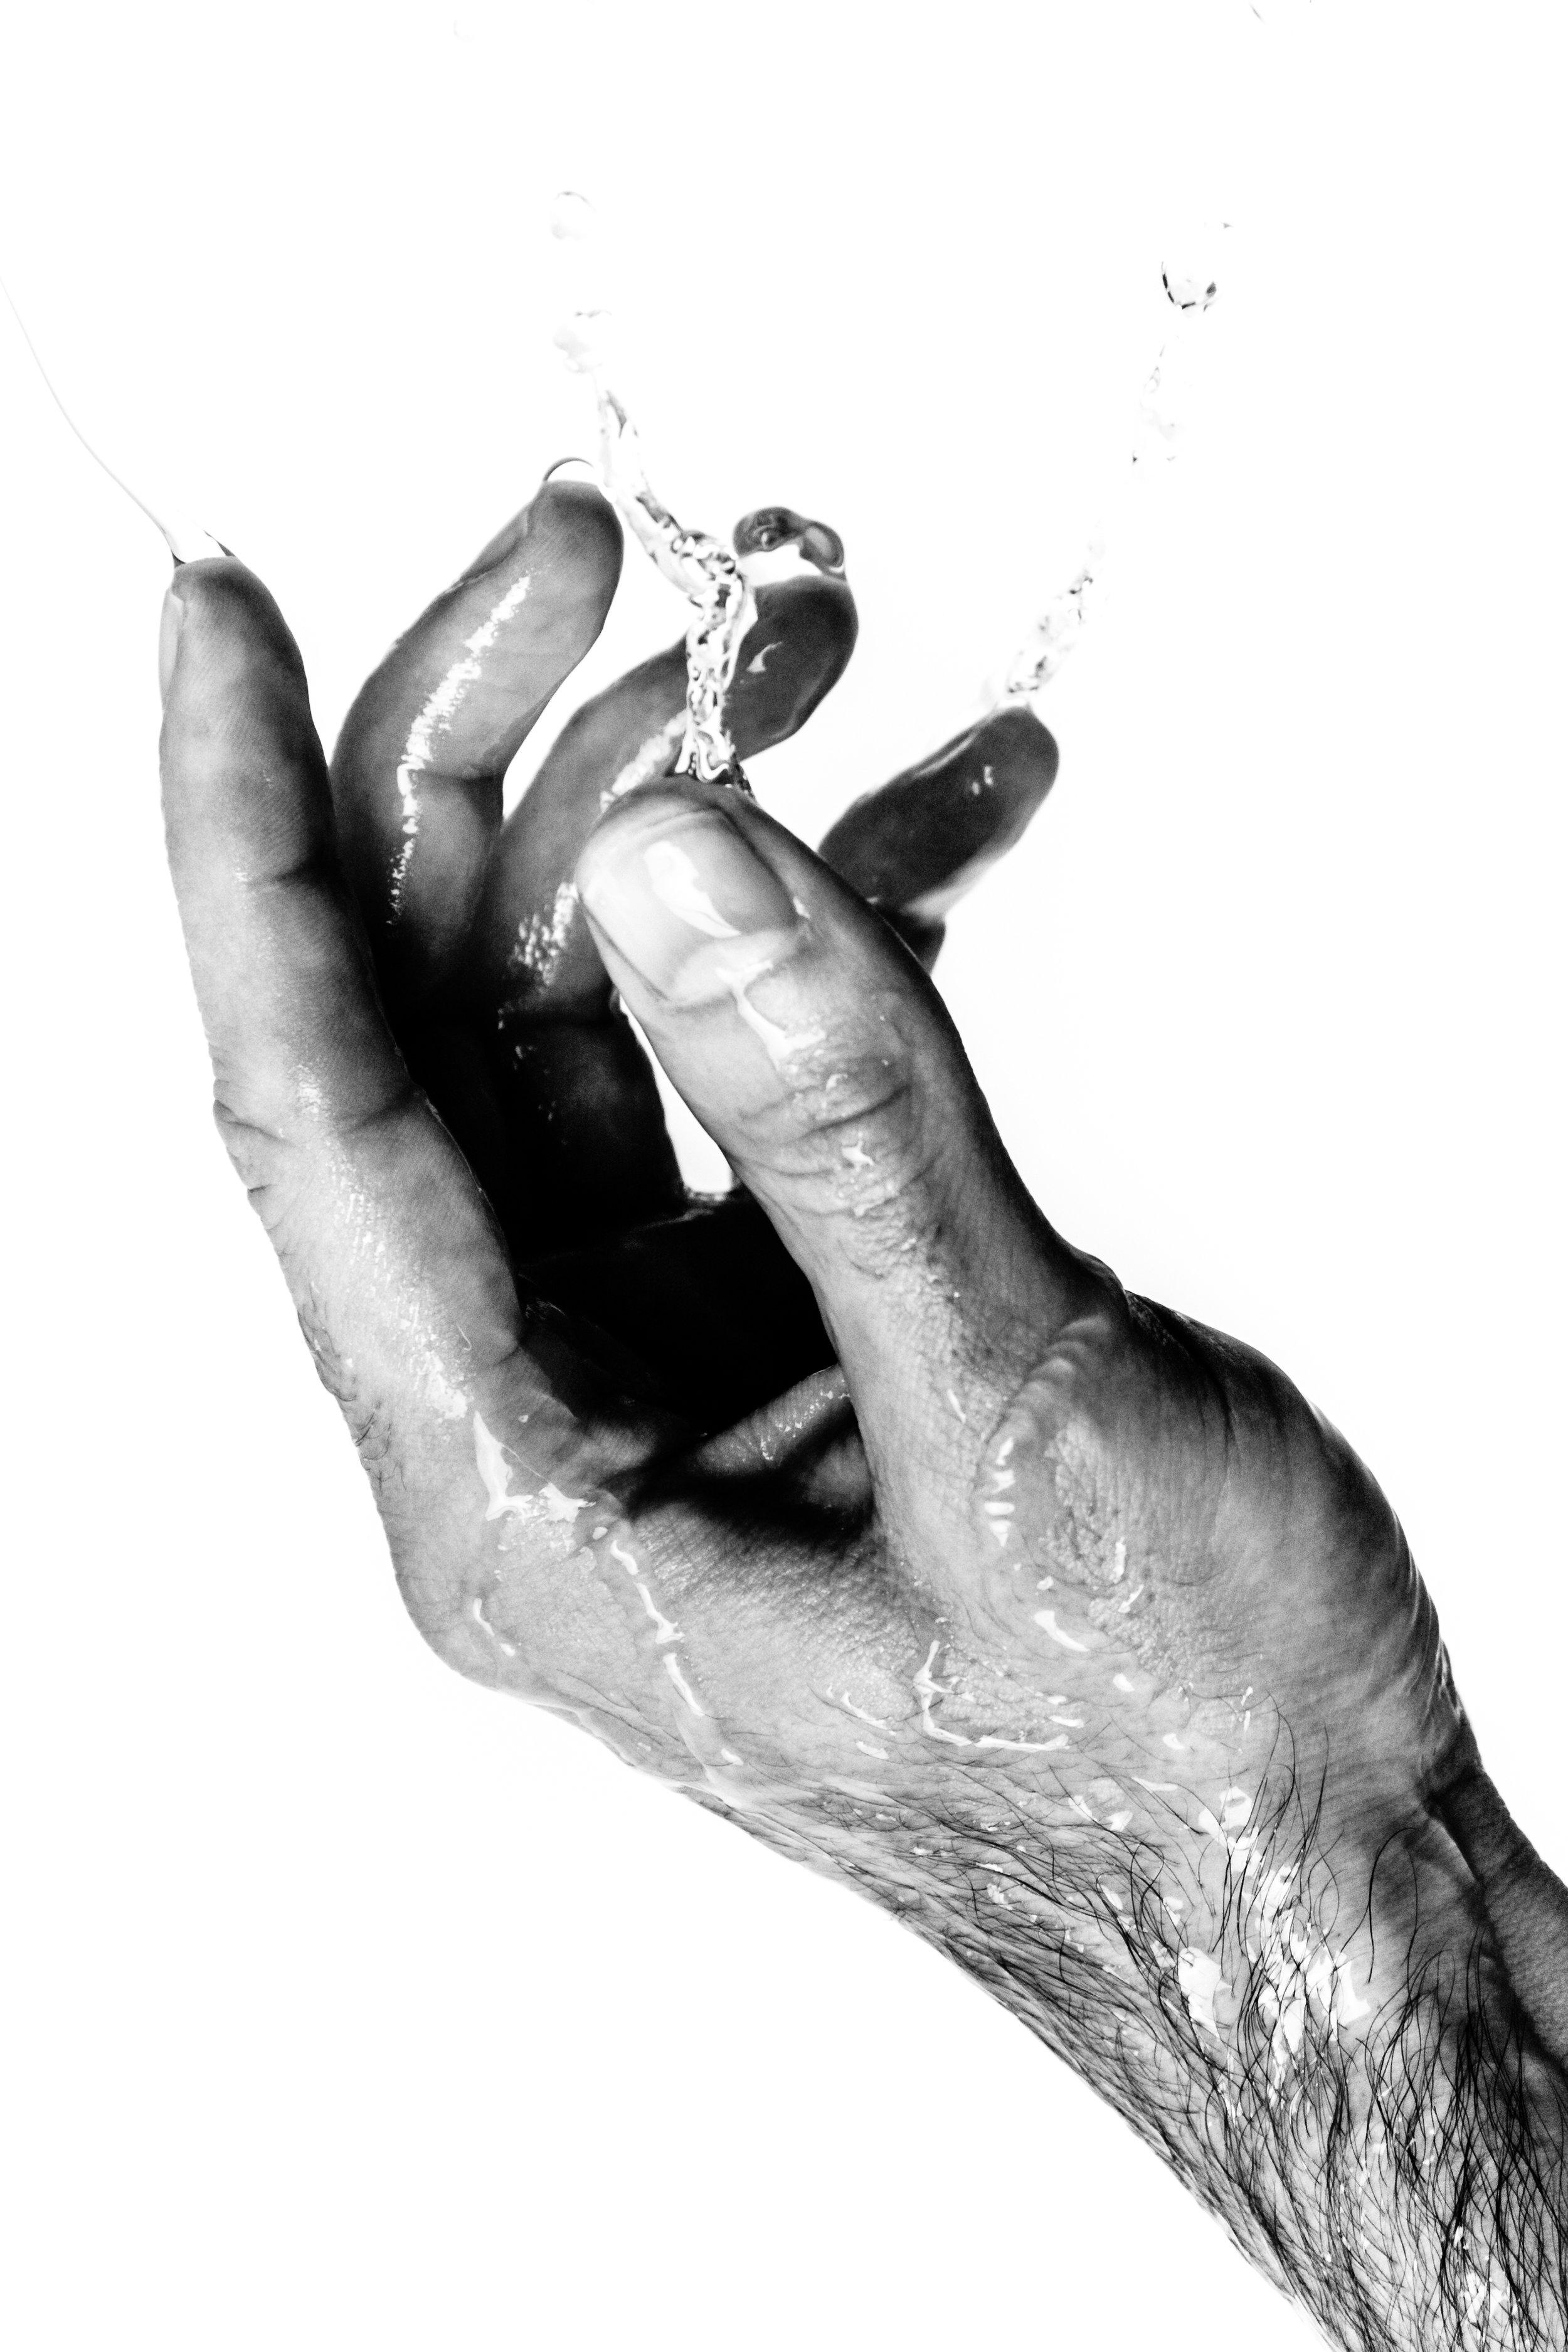 The_Hand_Water_Web.jpg